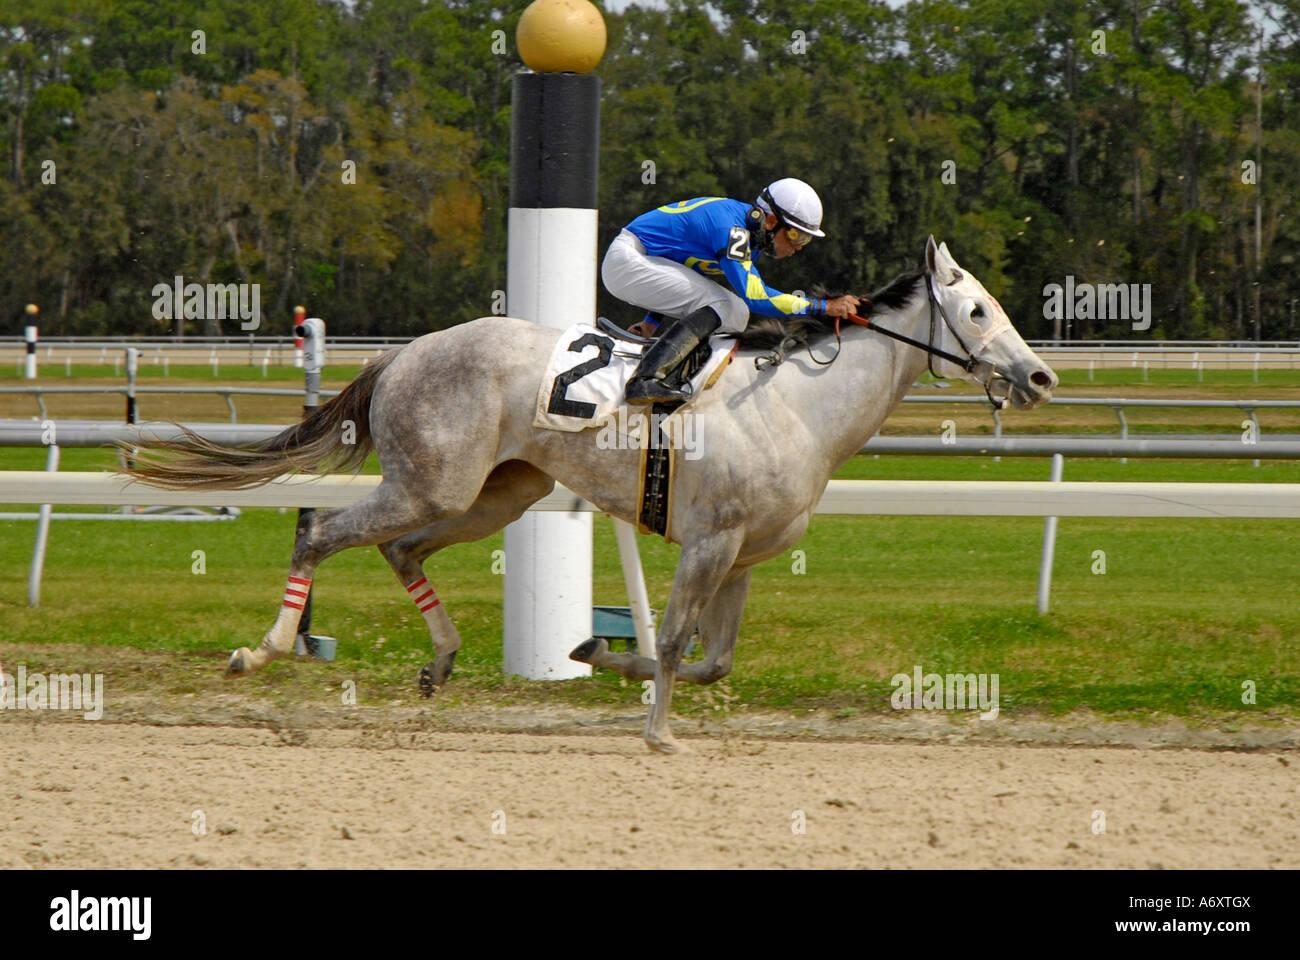 Thoroughbred horse racing Tampa Bay Downs Florida FL Tampa - Stock Image